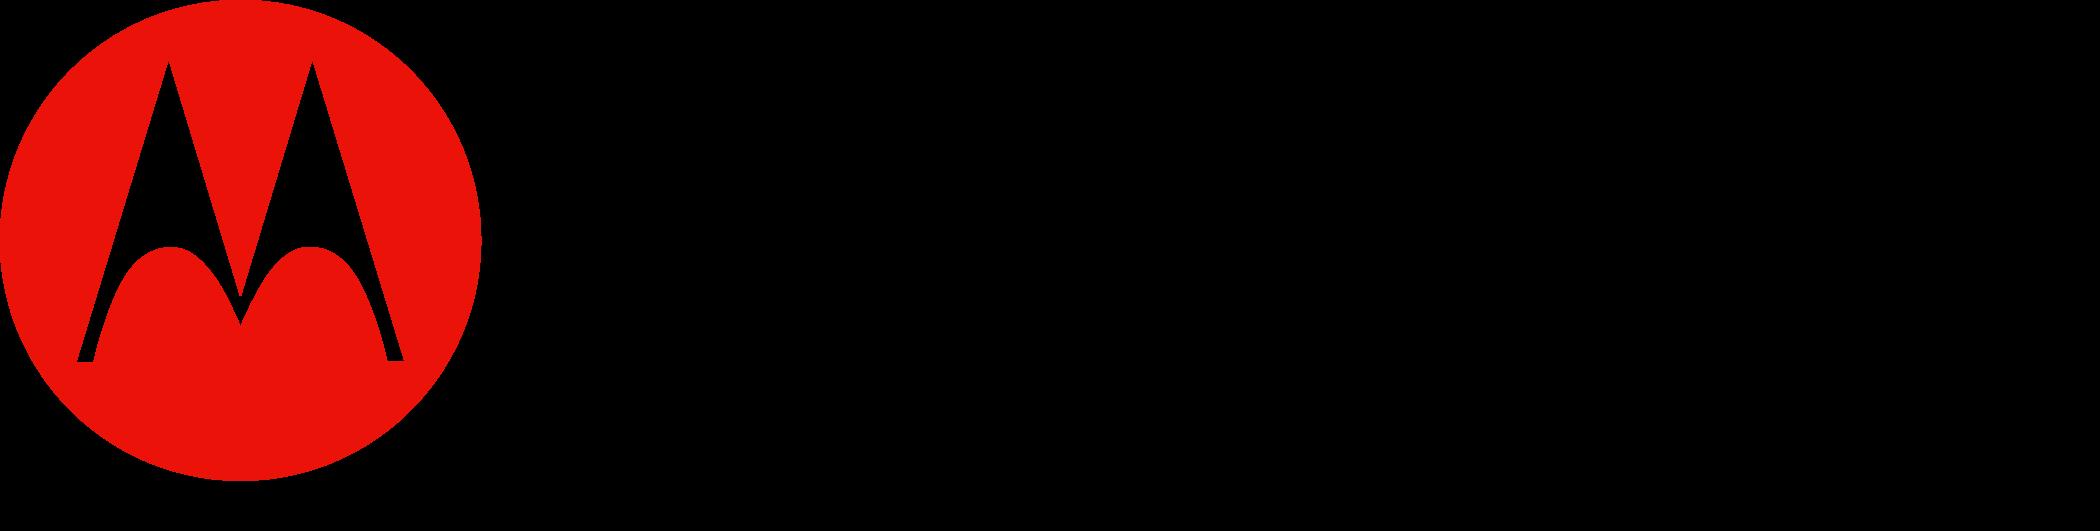 motorola logo lenovo - Motorola Logo